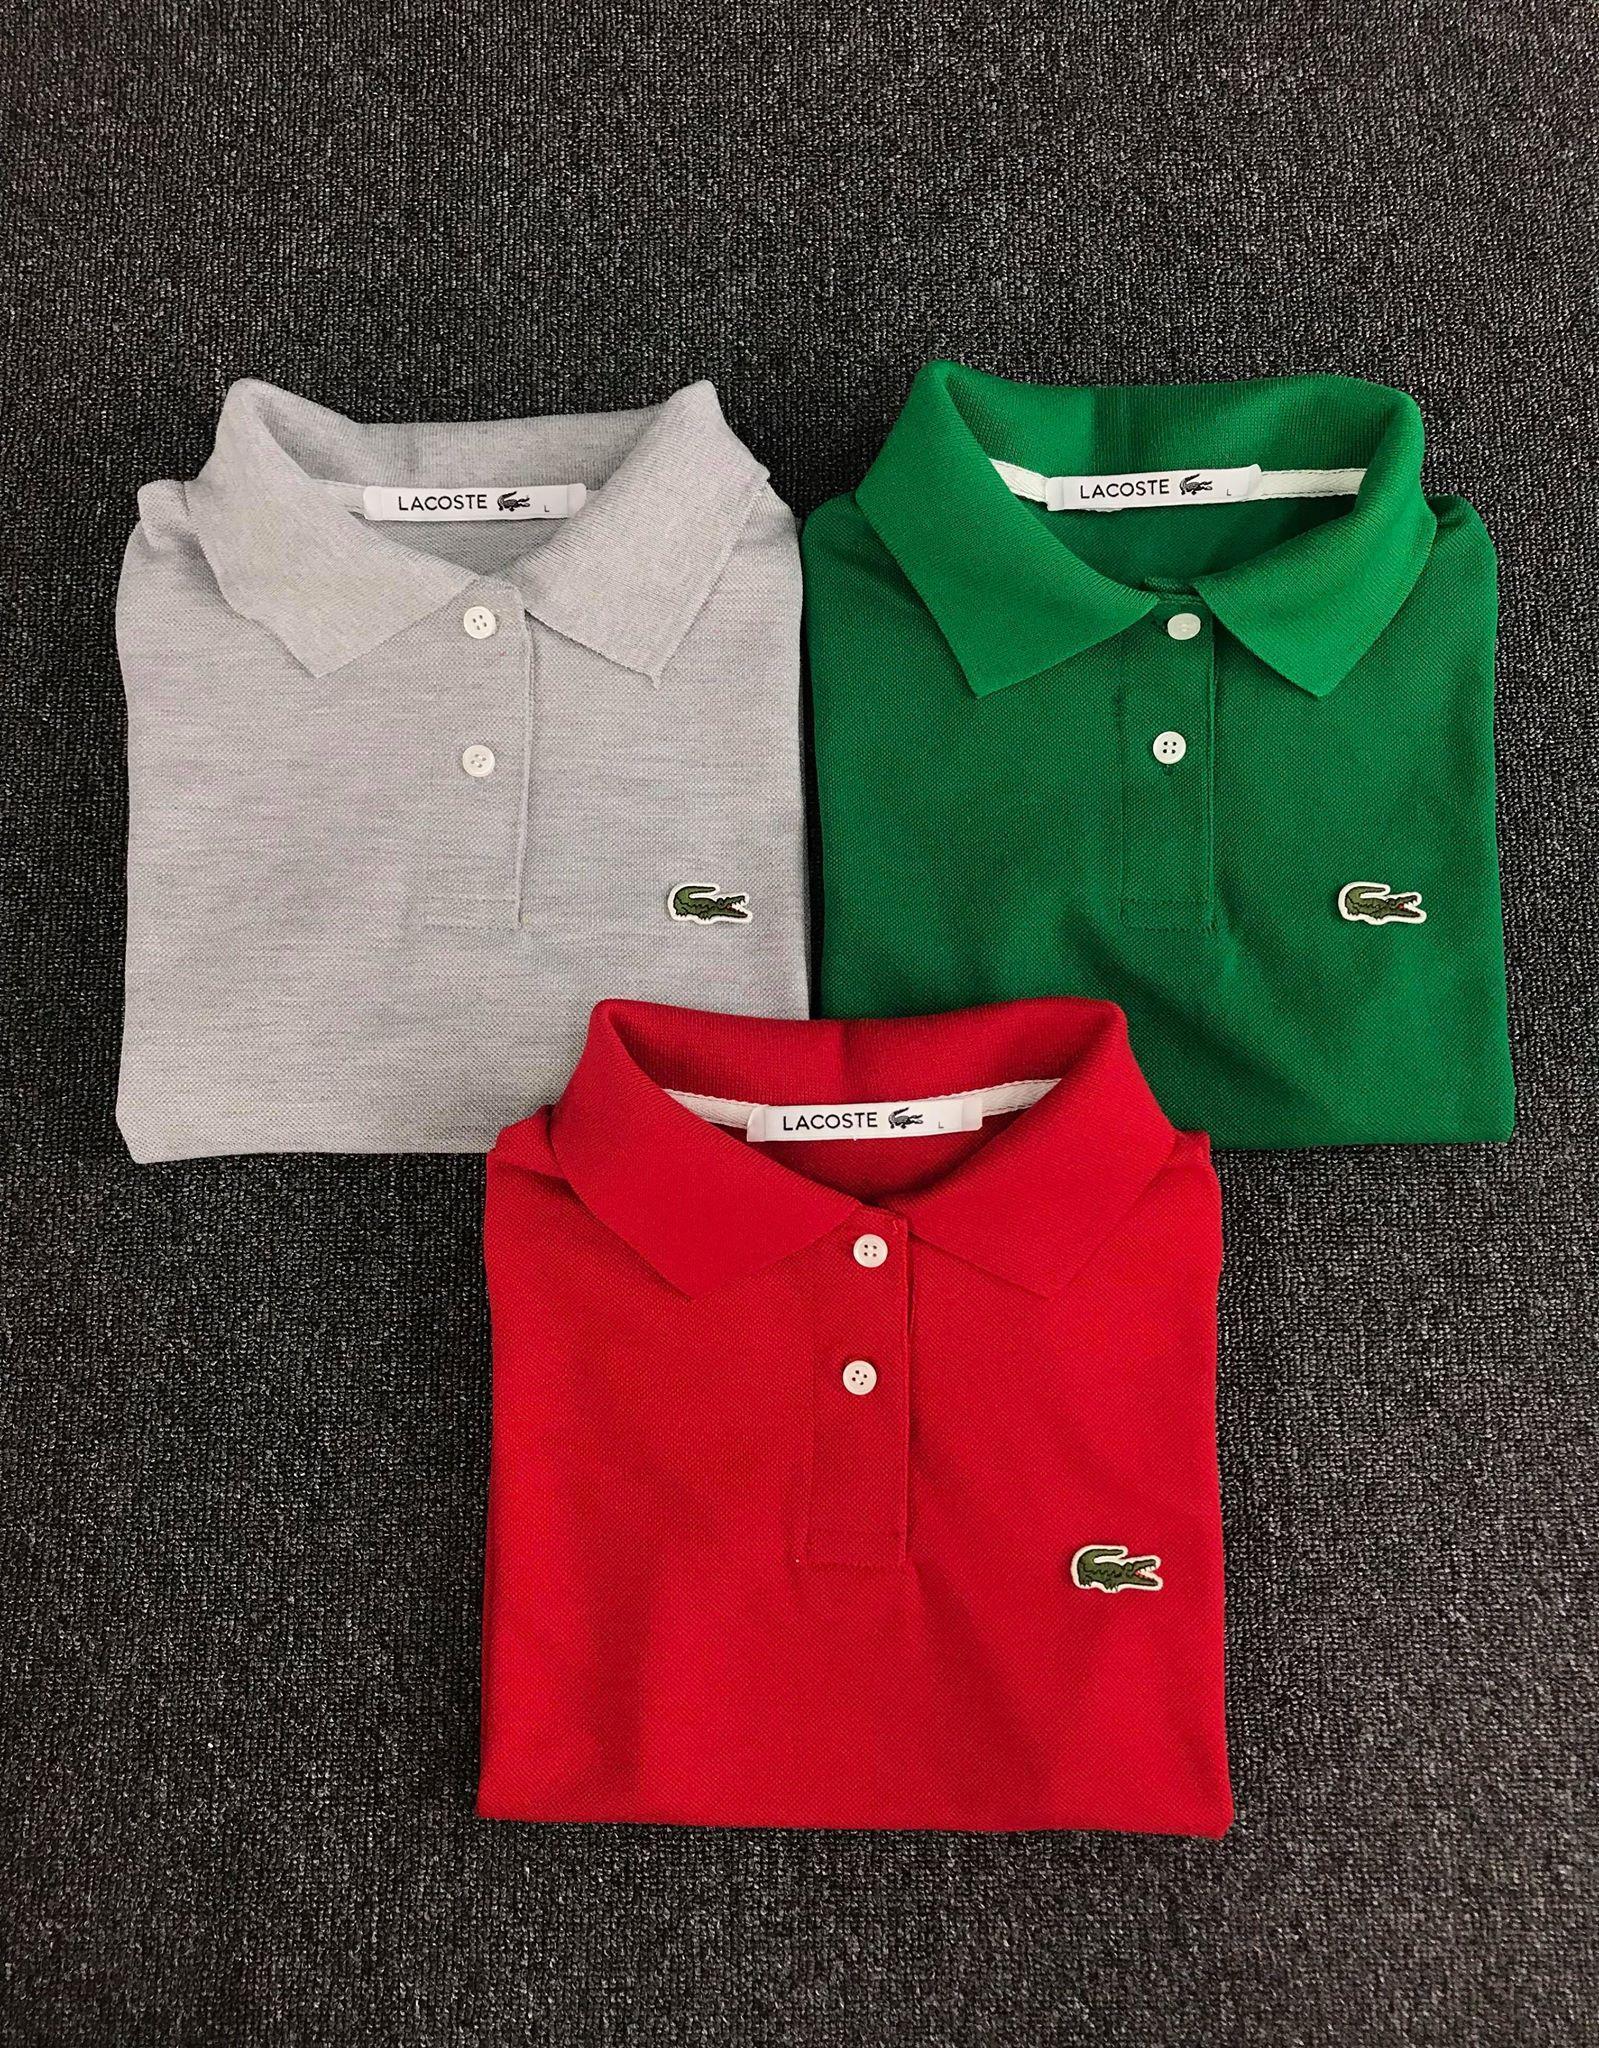 e060ae731 Lacoste Polo Shirts Wholesale Philippines